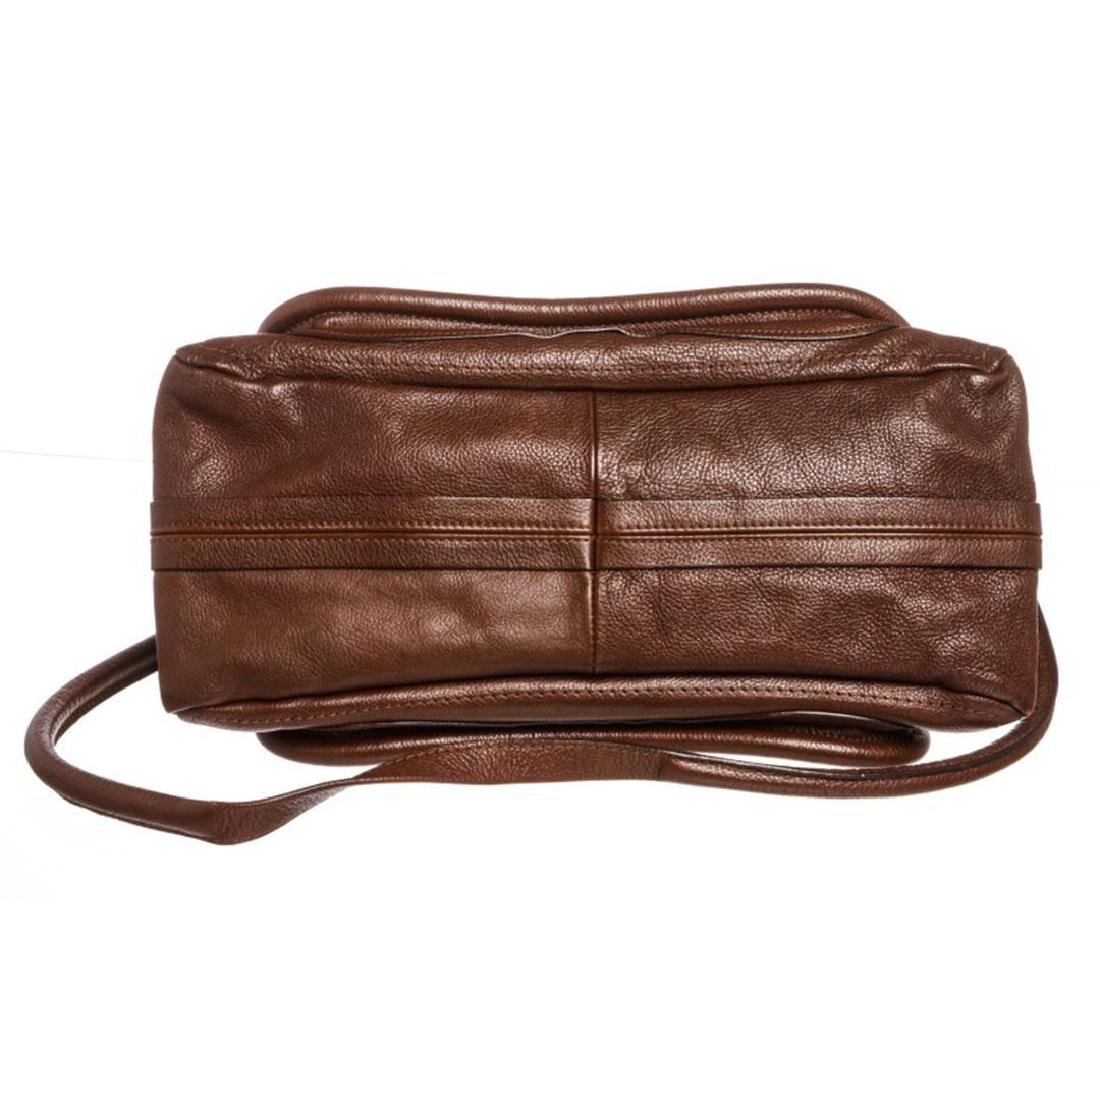 Chloe Brown Leather Paraty Medium Satchel Handbag - 4